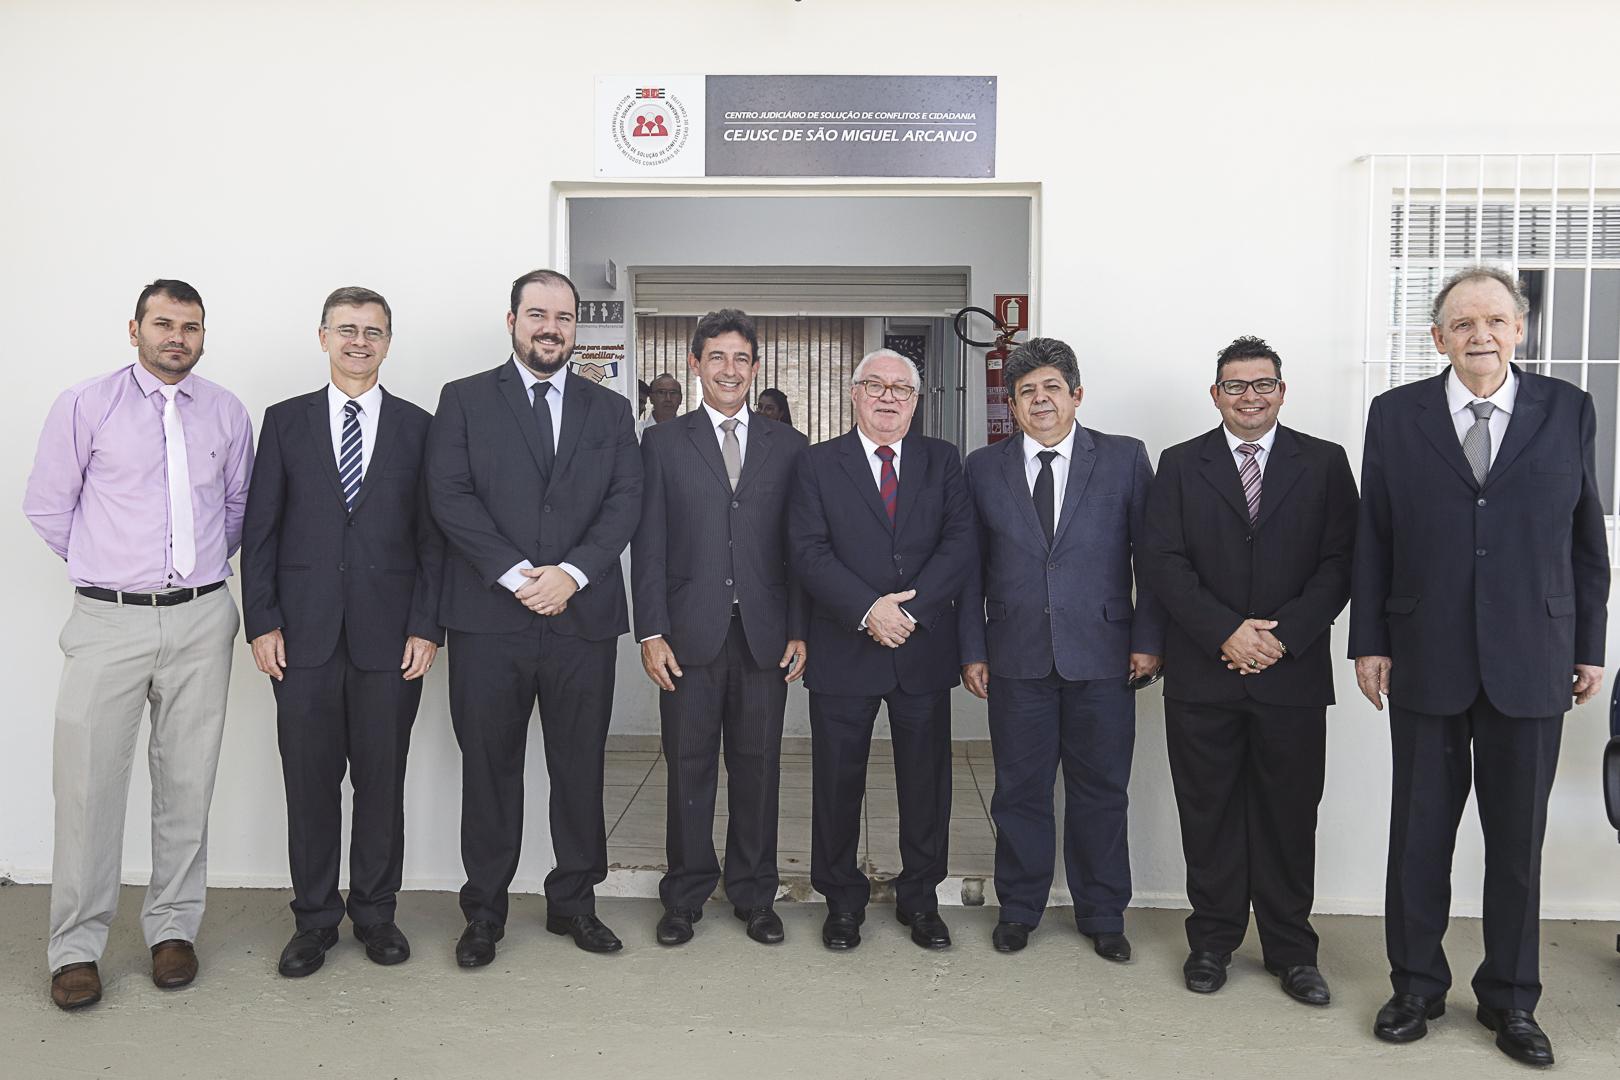 São Miguel Arcanjo recebe a visita do presidente do TJSP